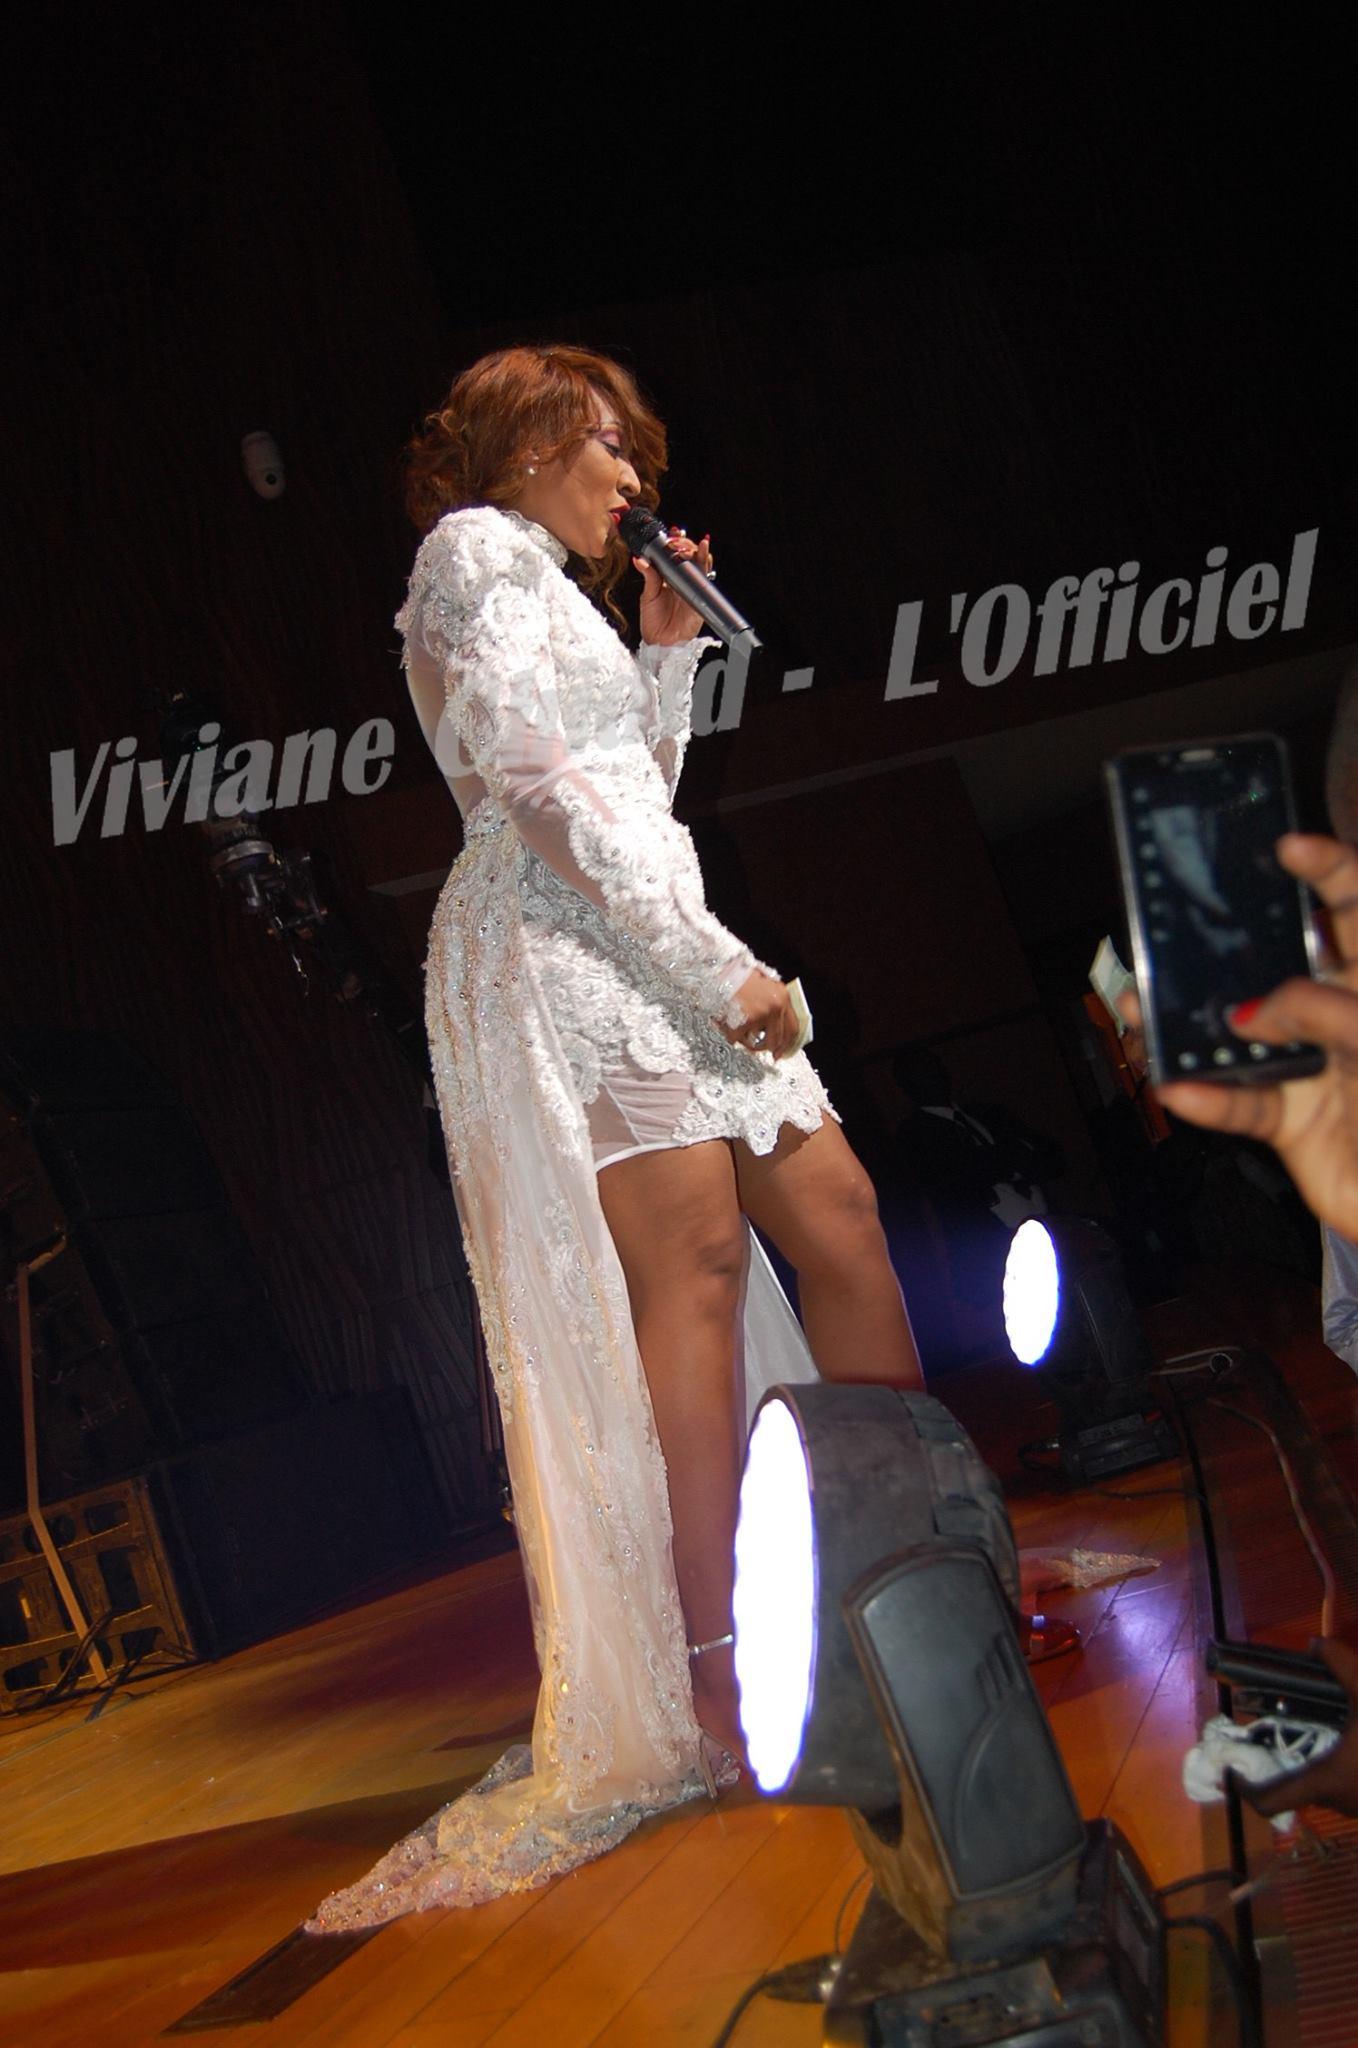 Viviane Chidid toujours sexy